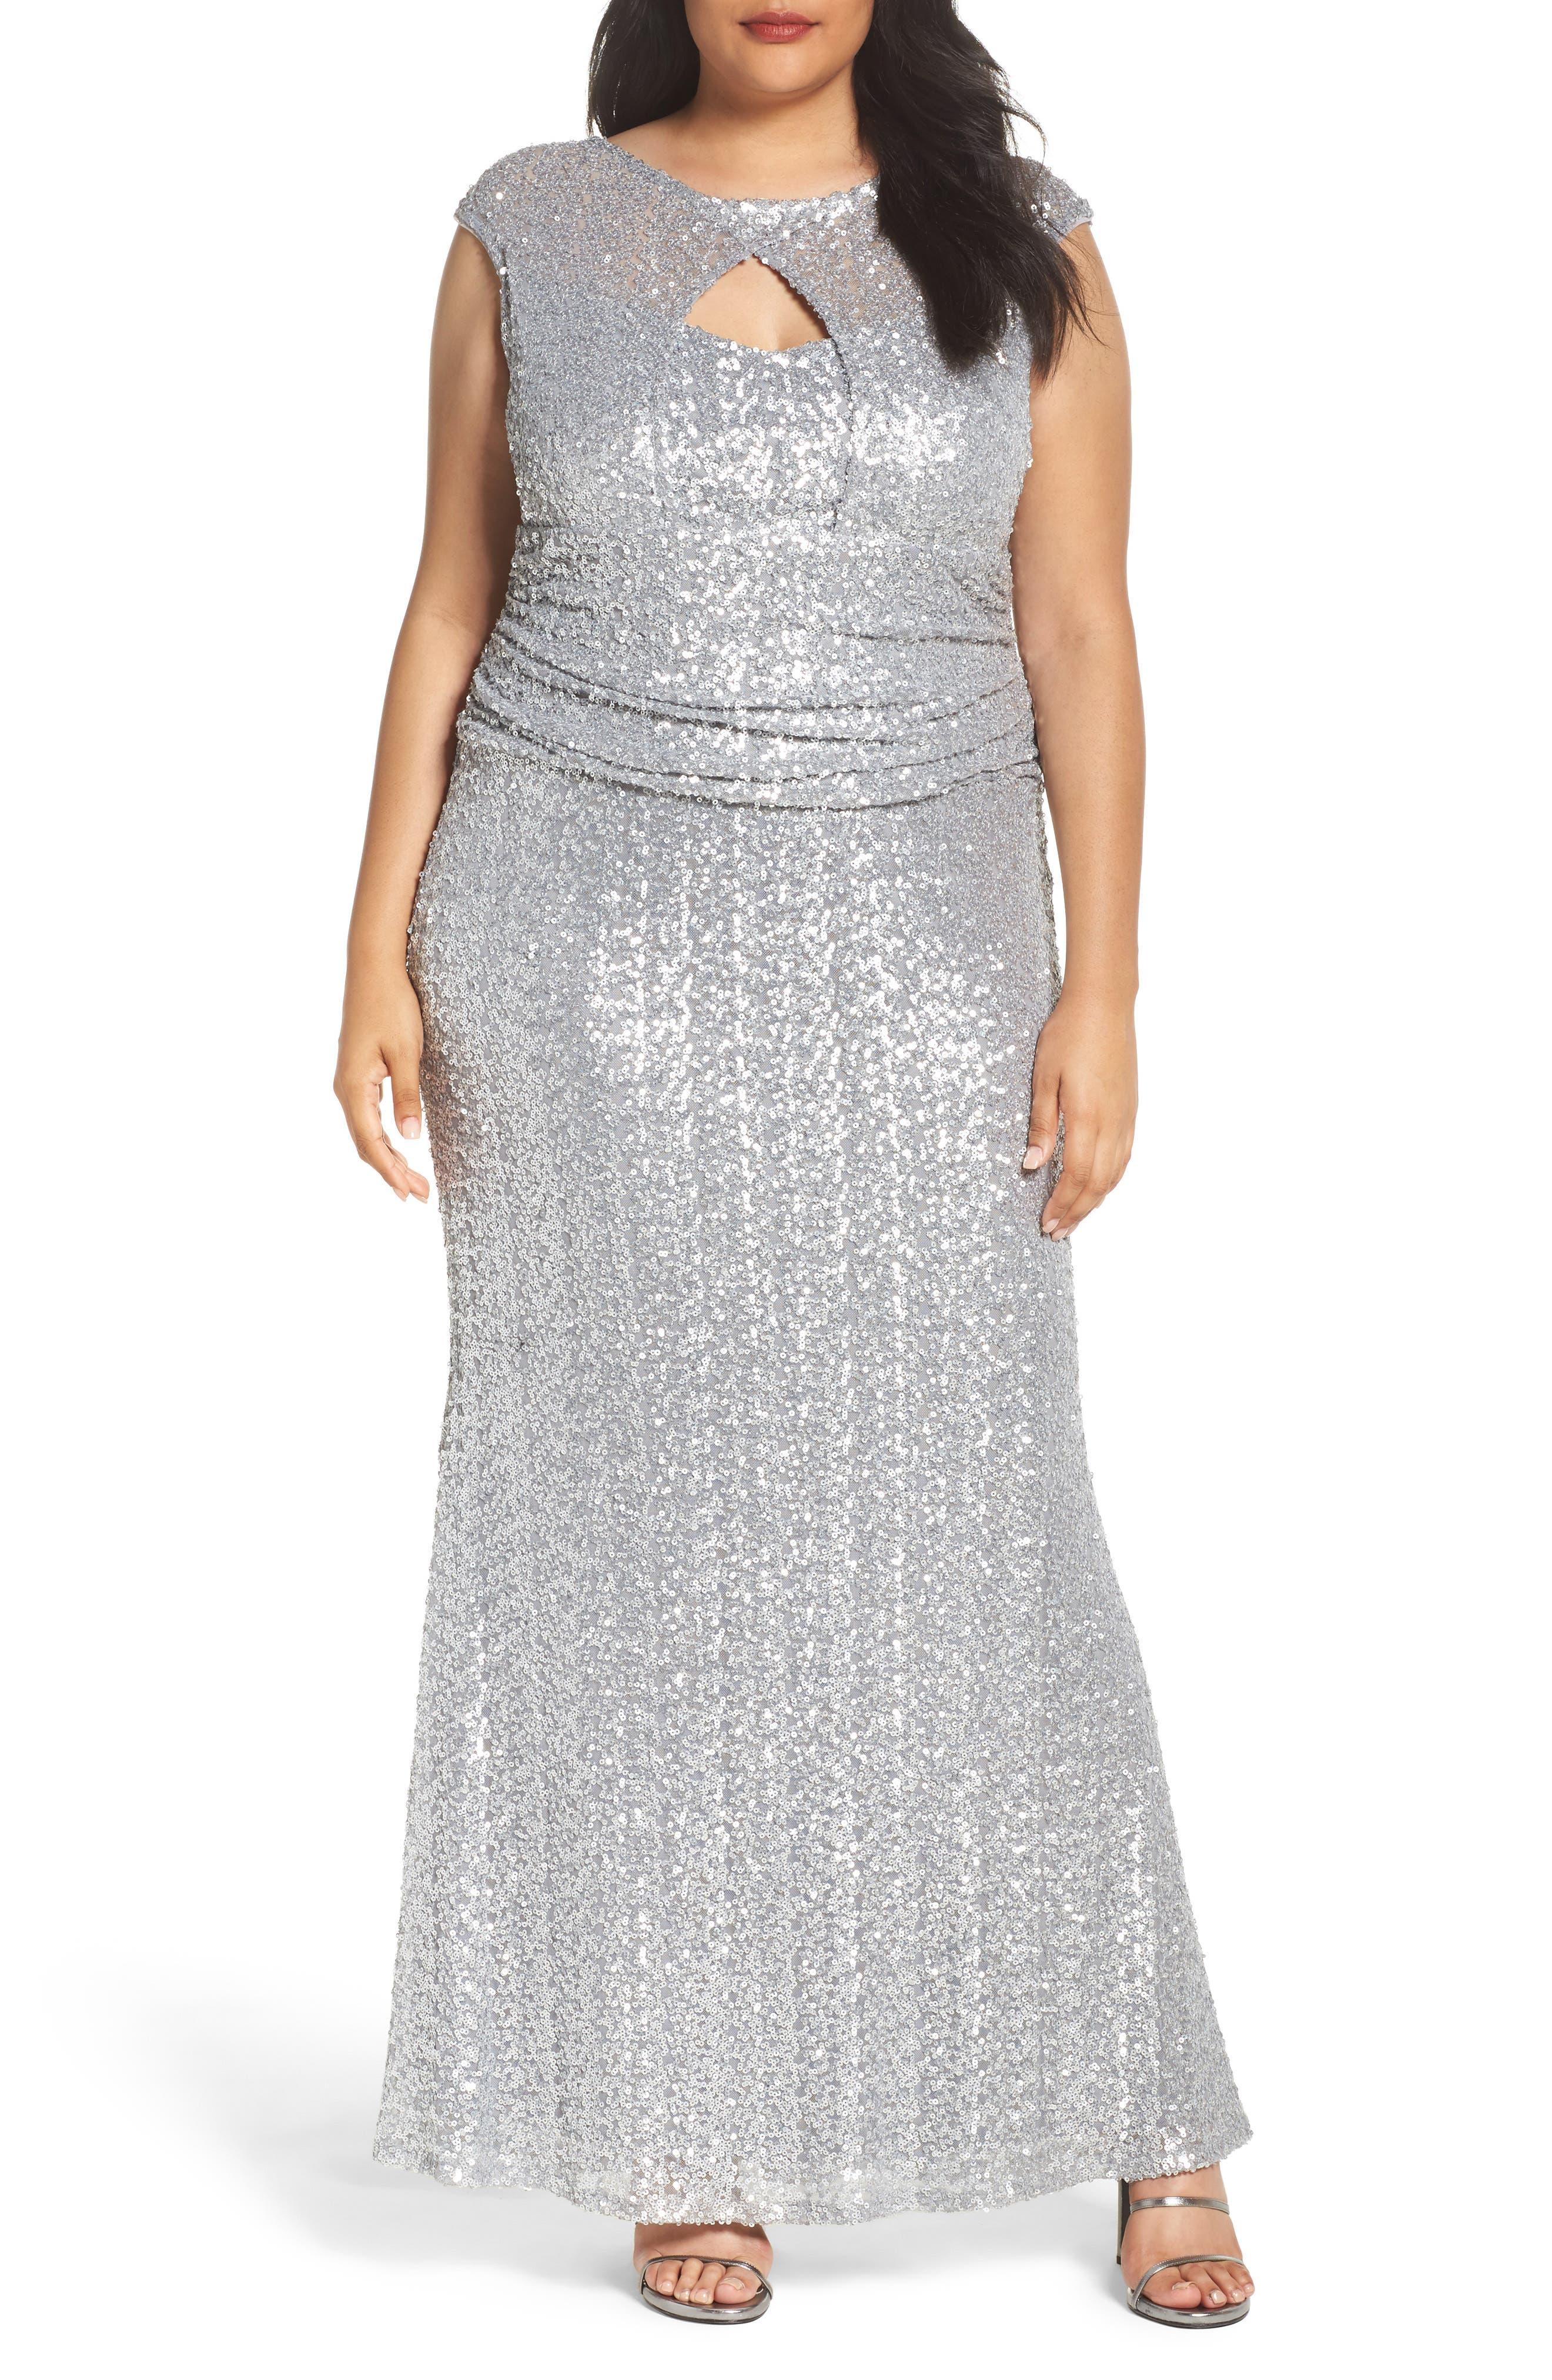 Main Image - Marina Cutout Sequin Lace Gown (Plus Size)